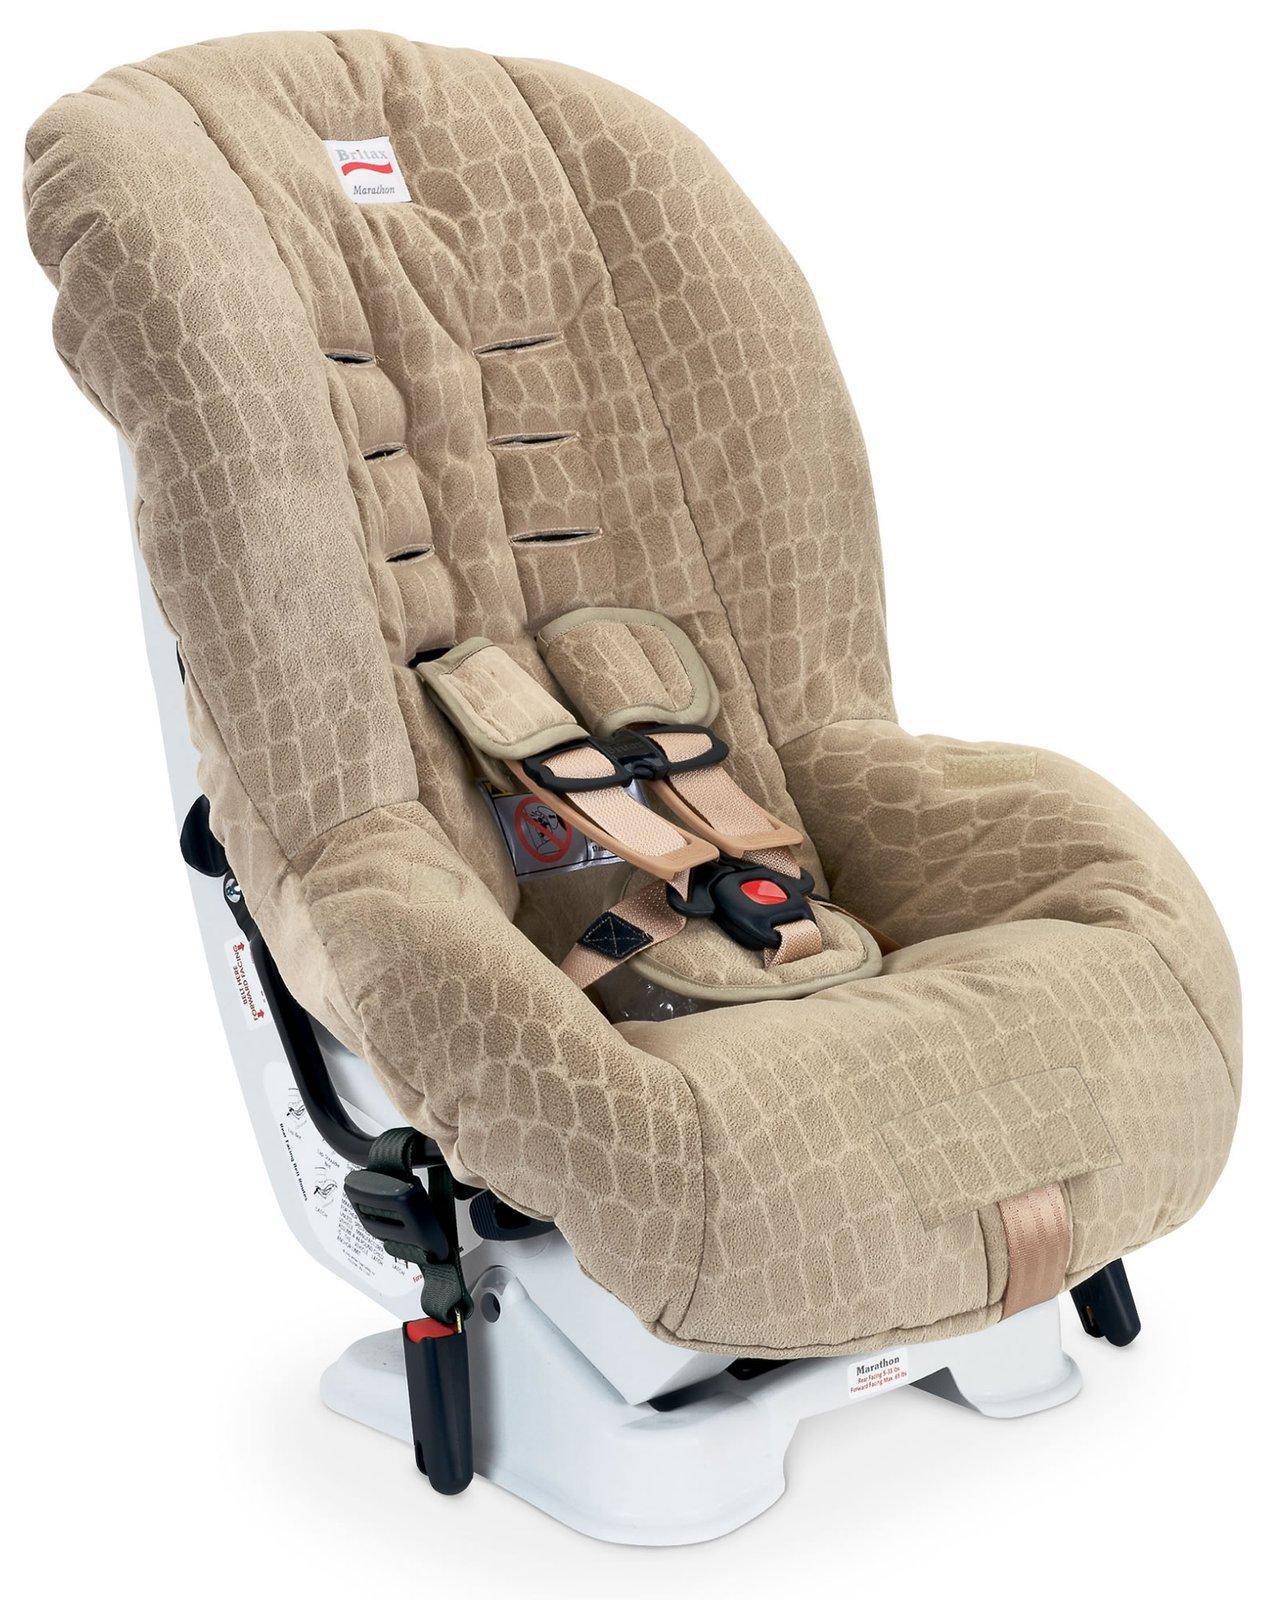 britax marathon car seat crocodile print reviews in car seats convertible chickadvisor. Black Bedroom Furniture Sets. Home Design Ideas